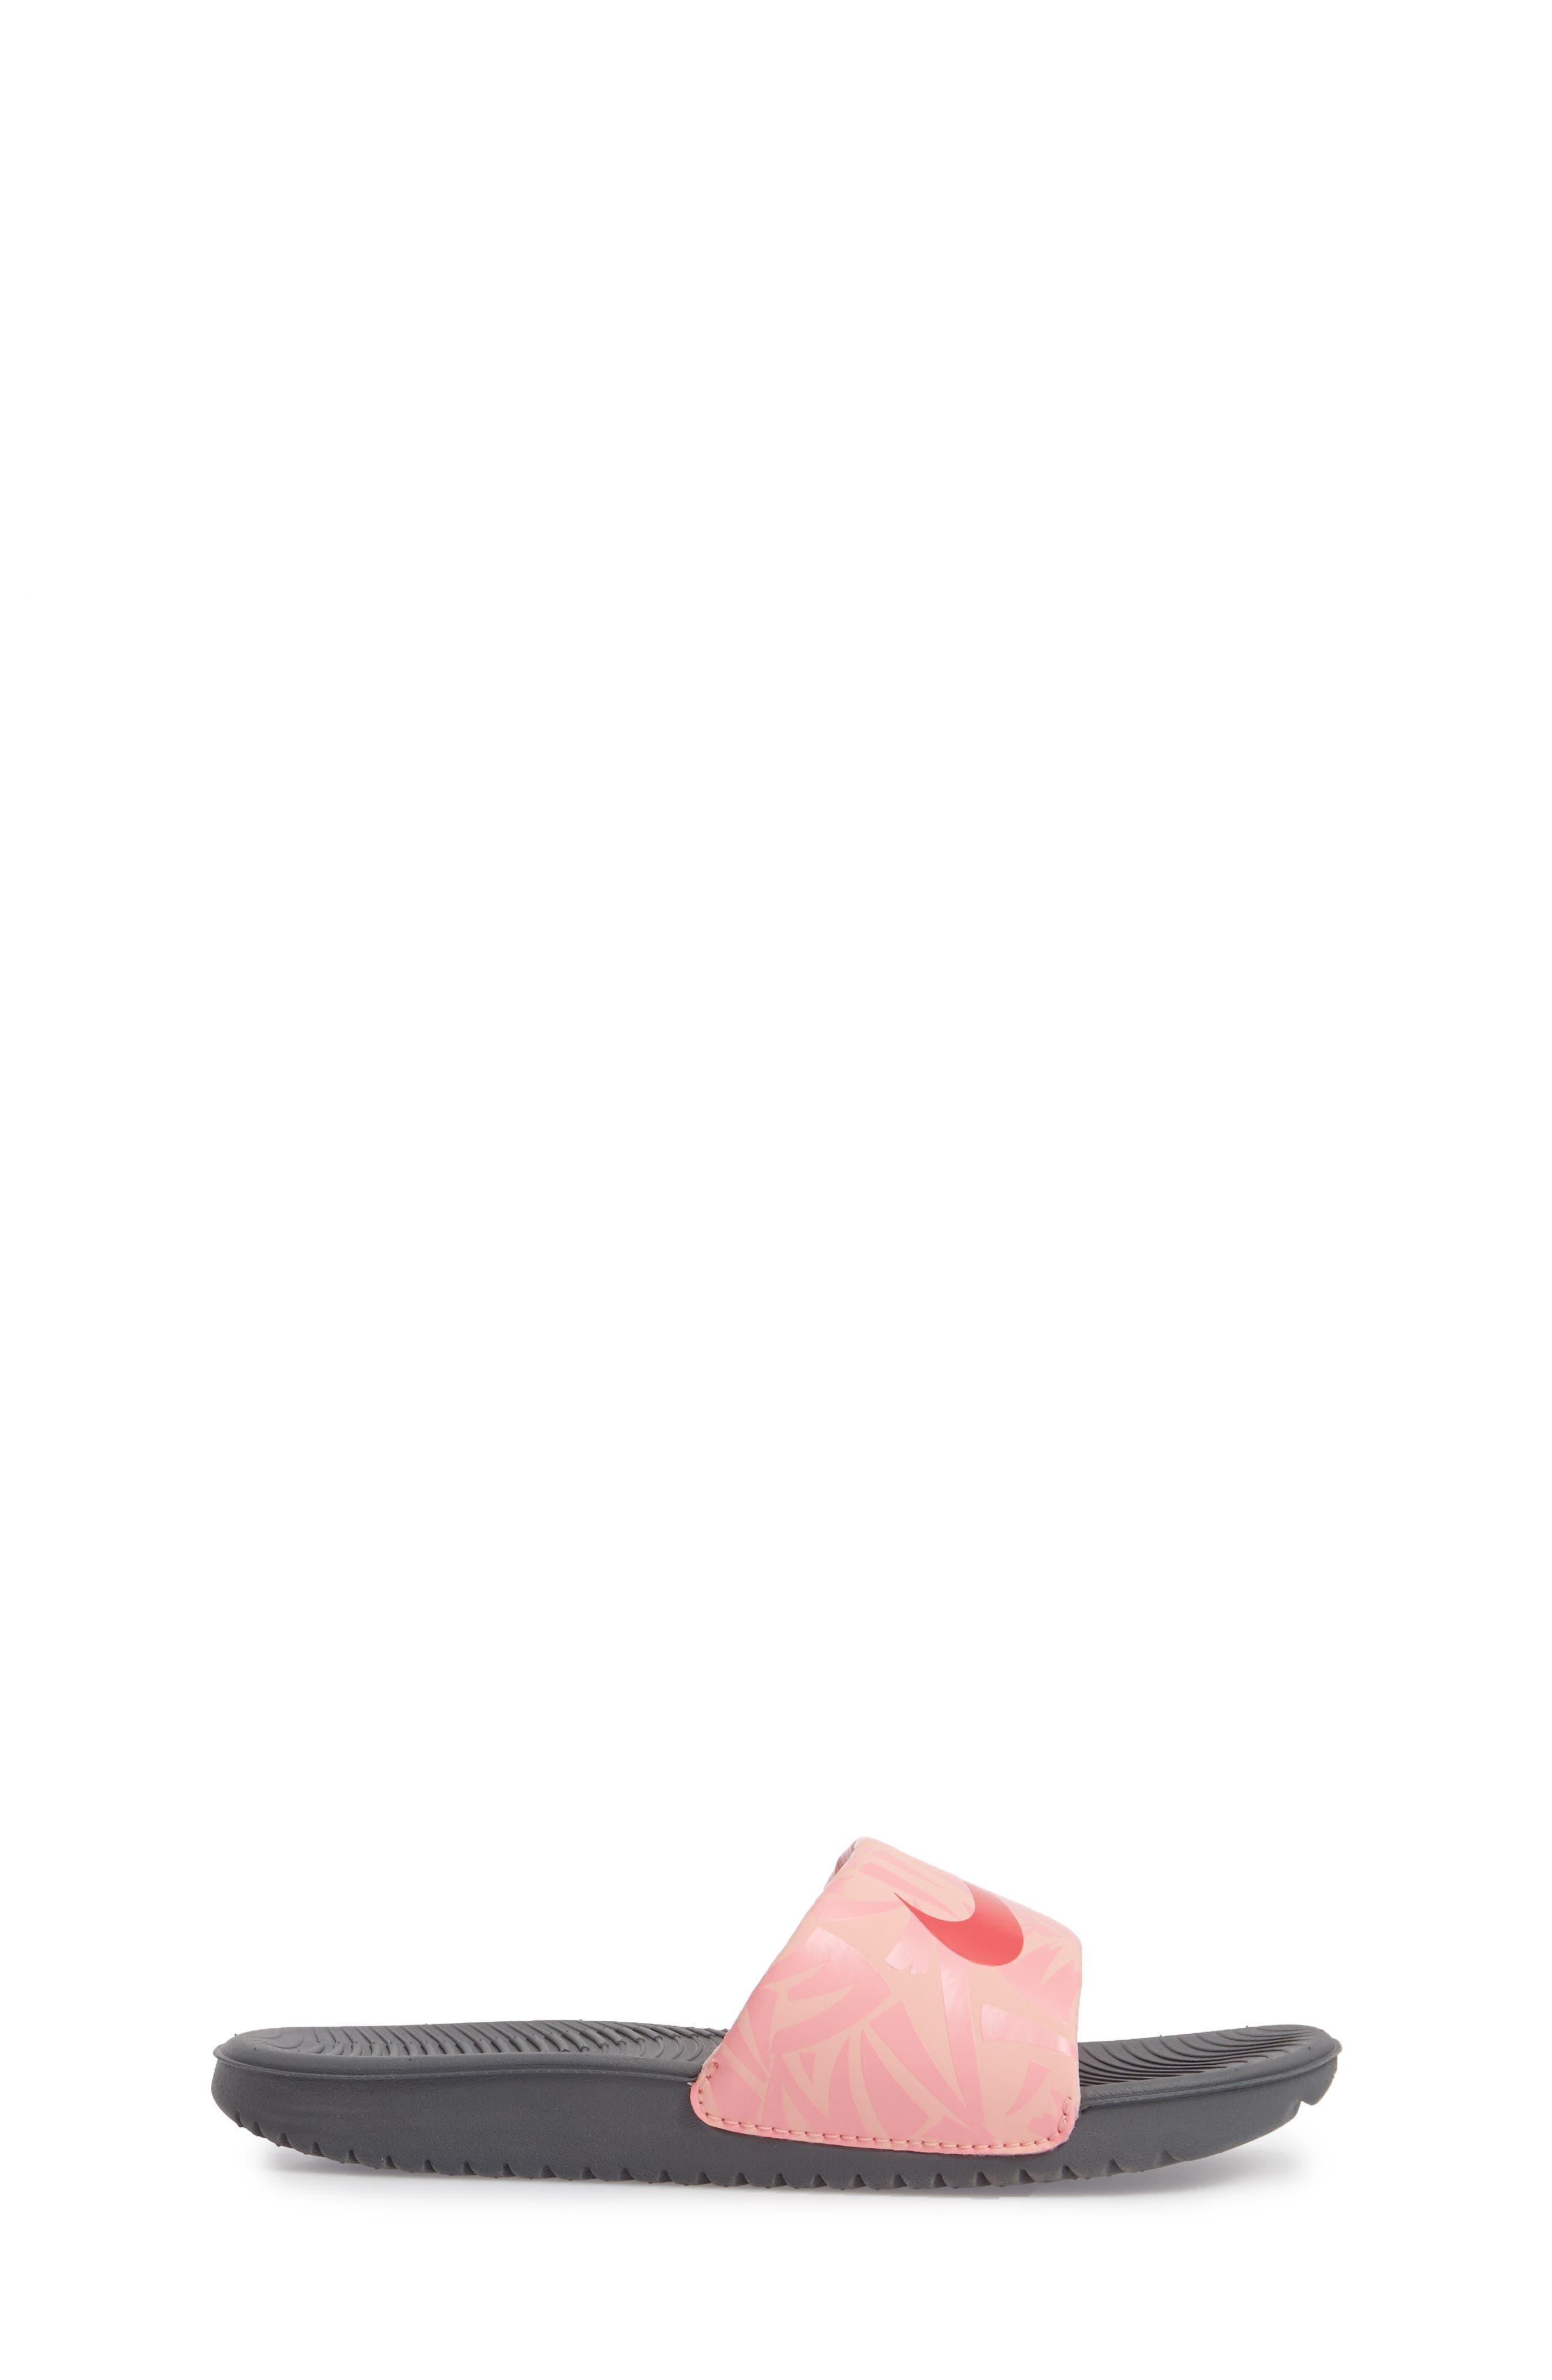 'Kawa' Print Slide Sandal,                             Alternate thumbnail 3, color,                             Grey/ Tropical Pink/ Coral